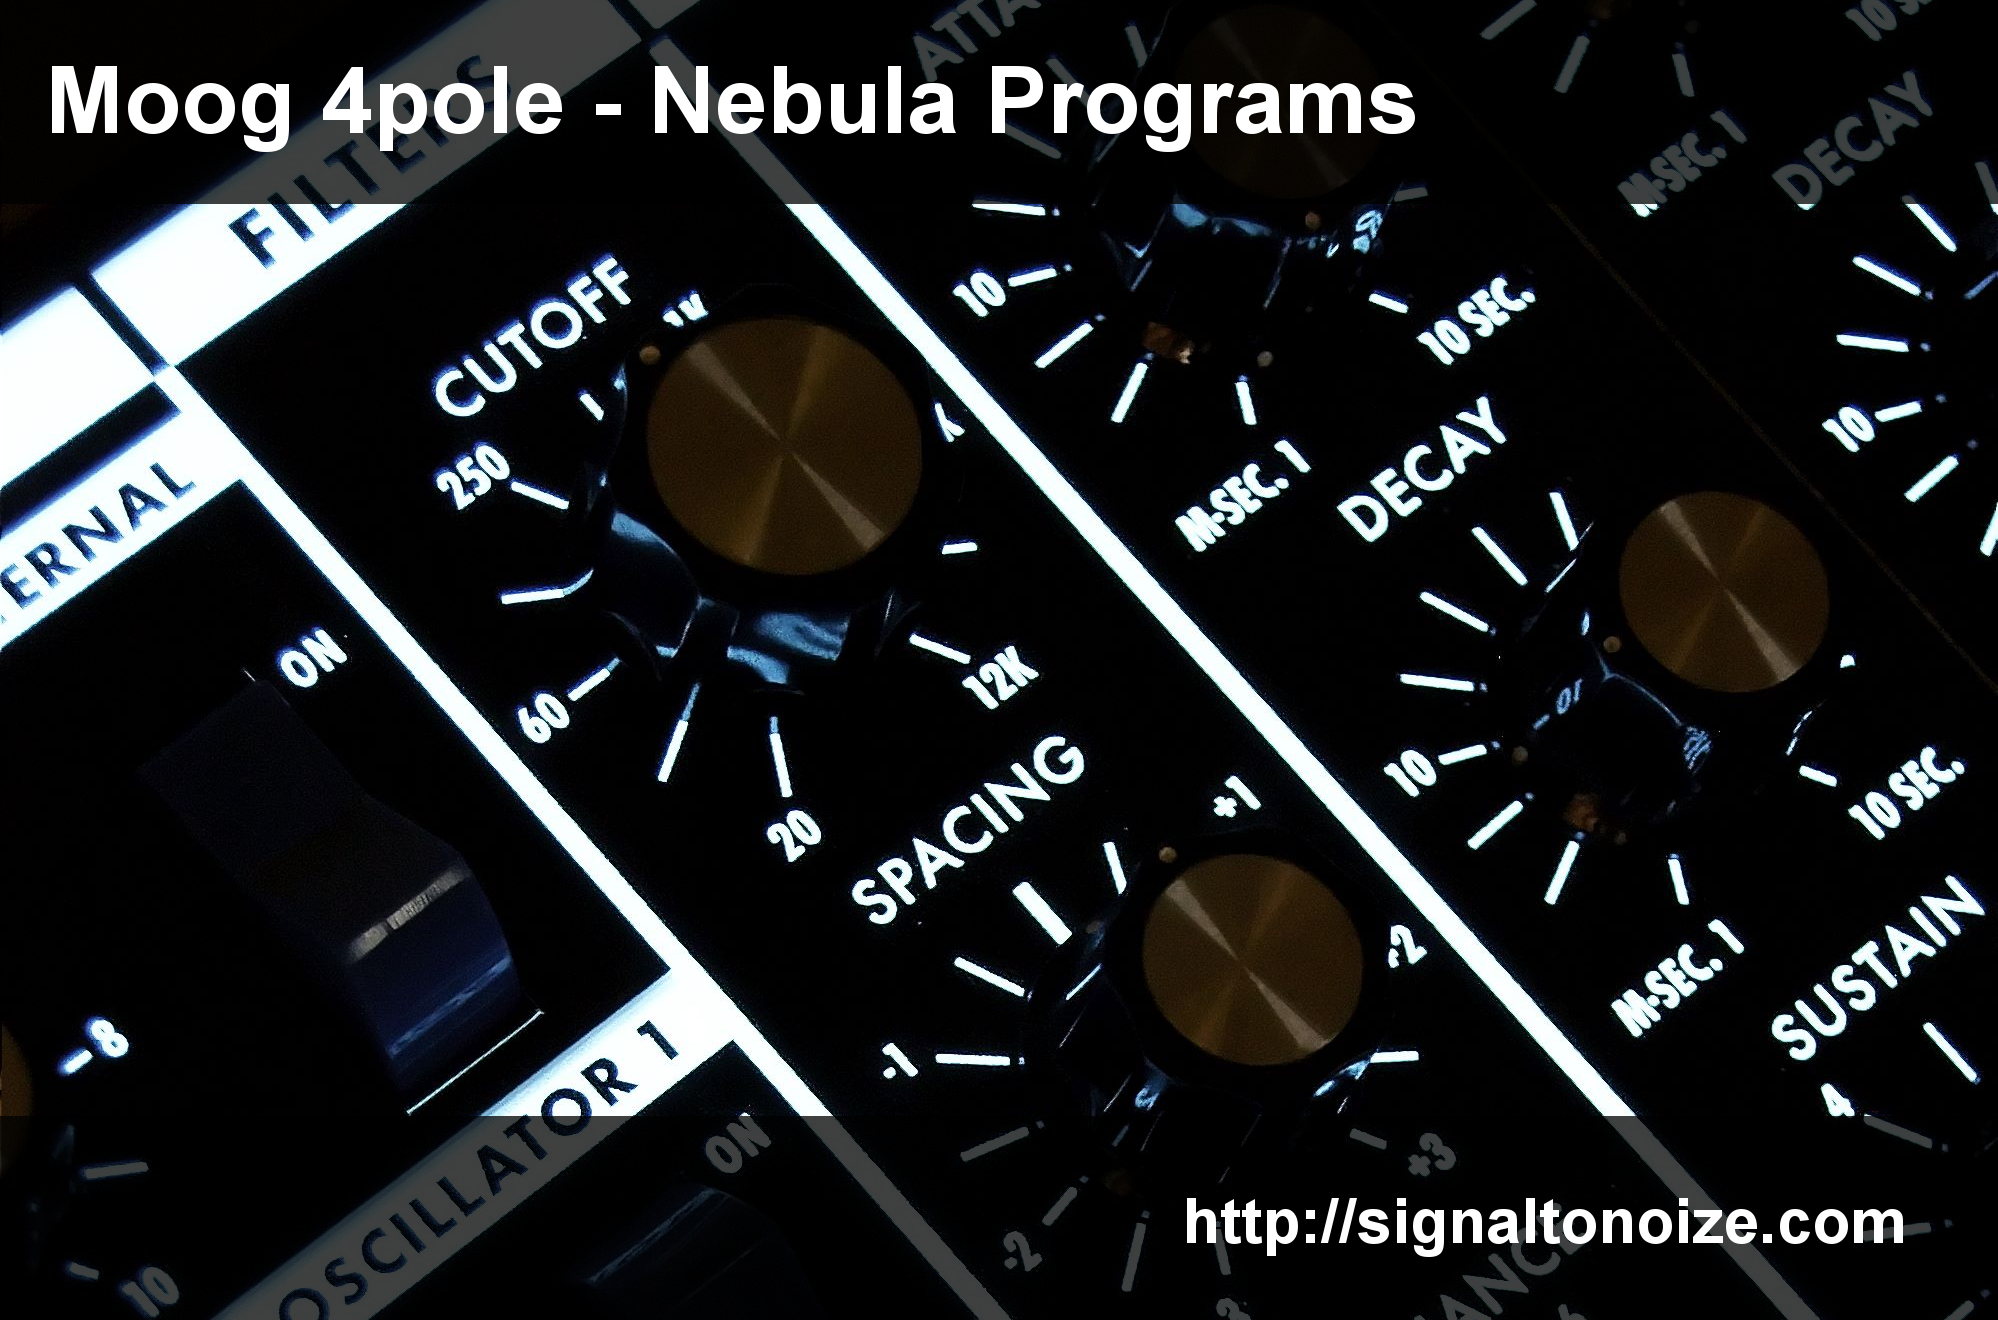 Moog 4pole – Nebula Programs